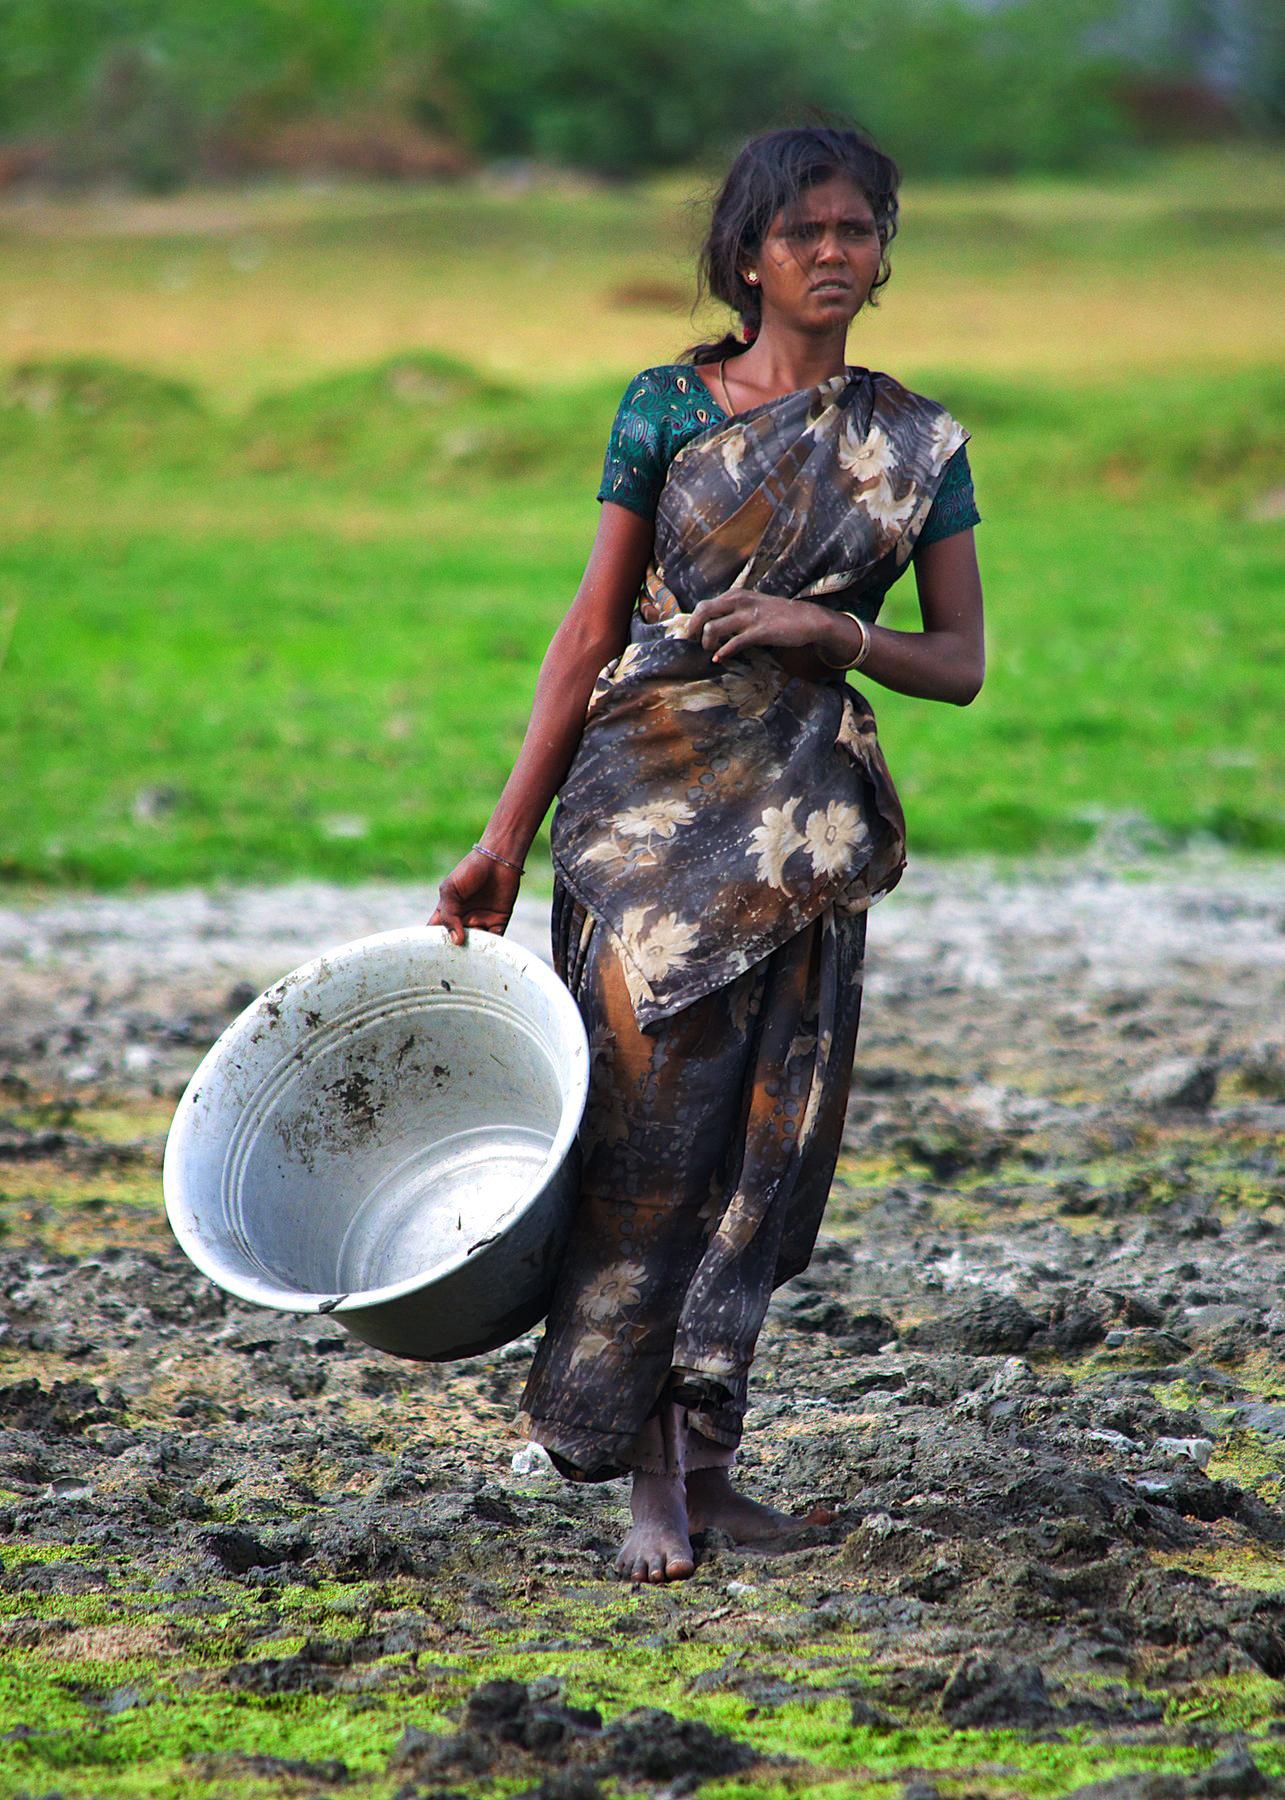 Farming in India